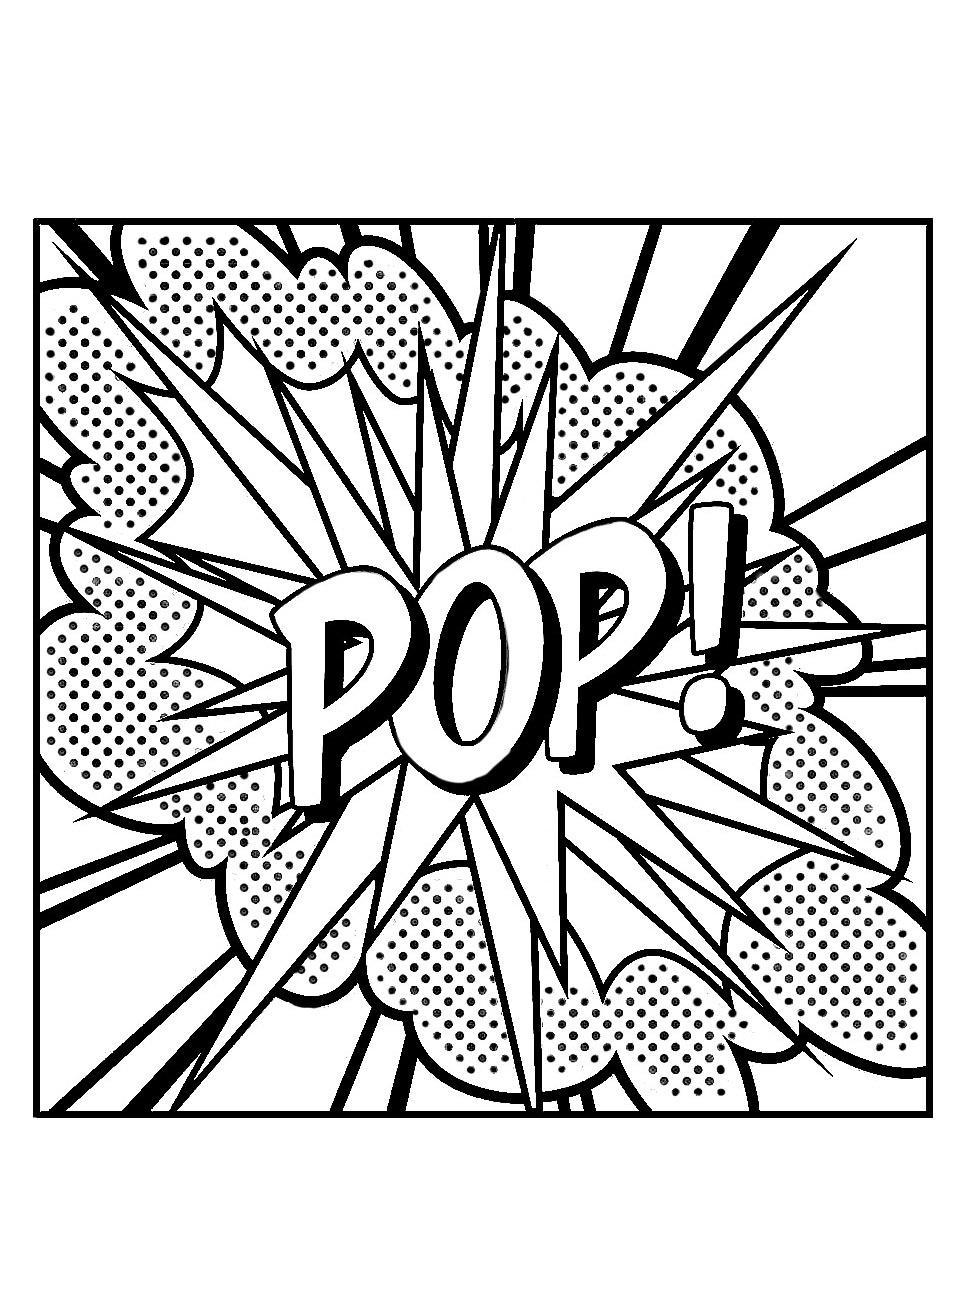 Pop art 23156 - Pop art - Colorear para Adultos